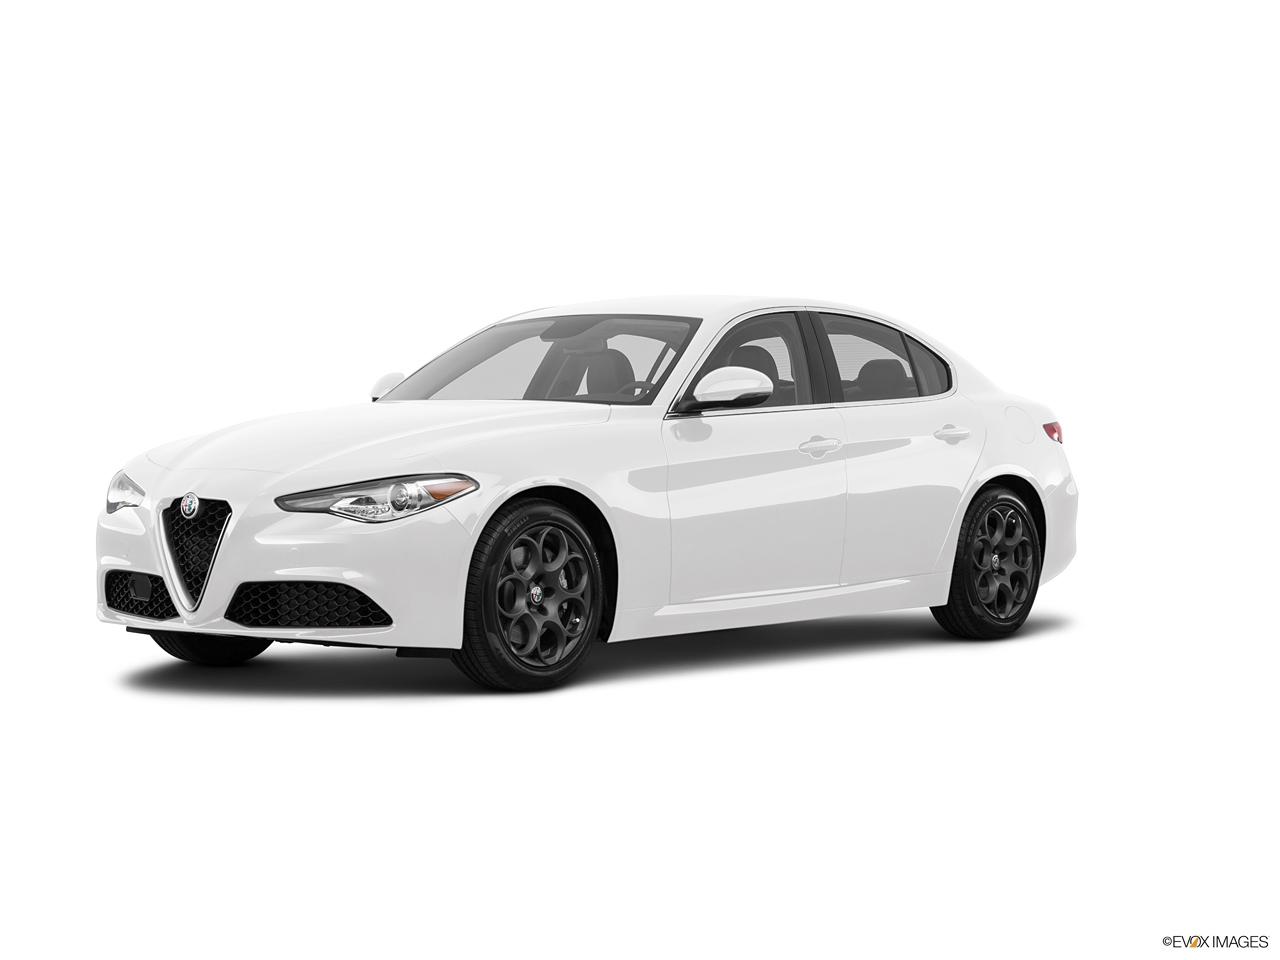 Alfa Romeo Giulia 2017 Base In UAE: New Car Prices, Specs